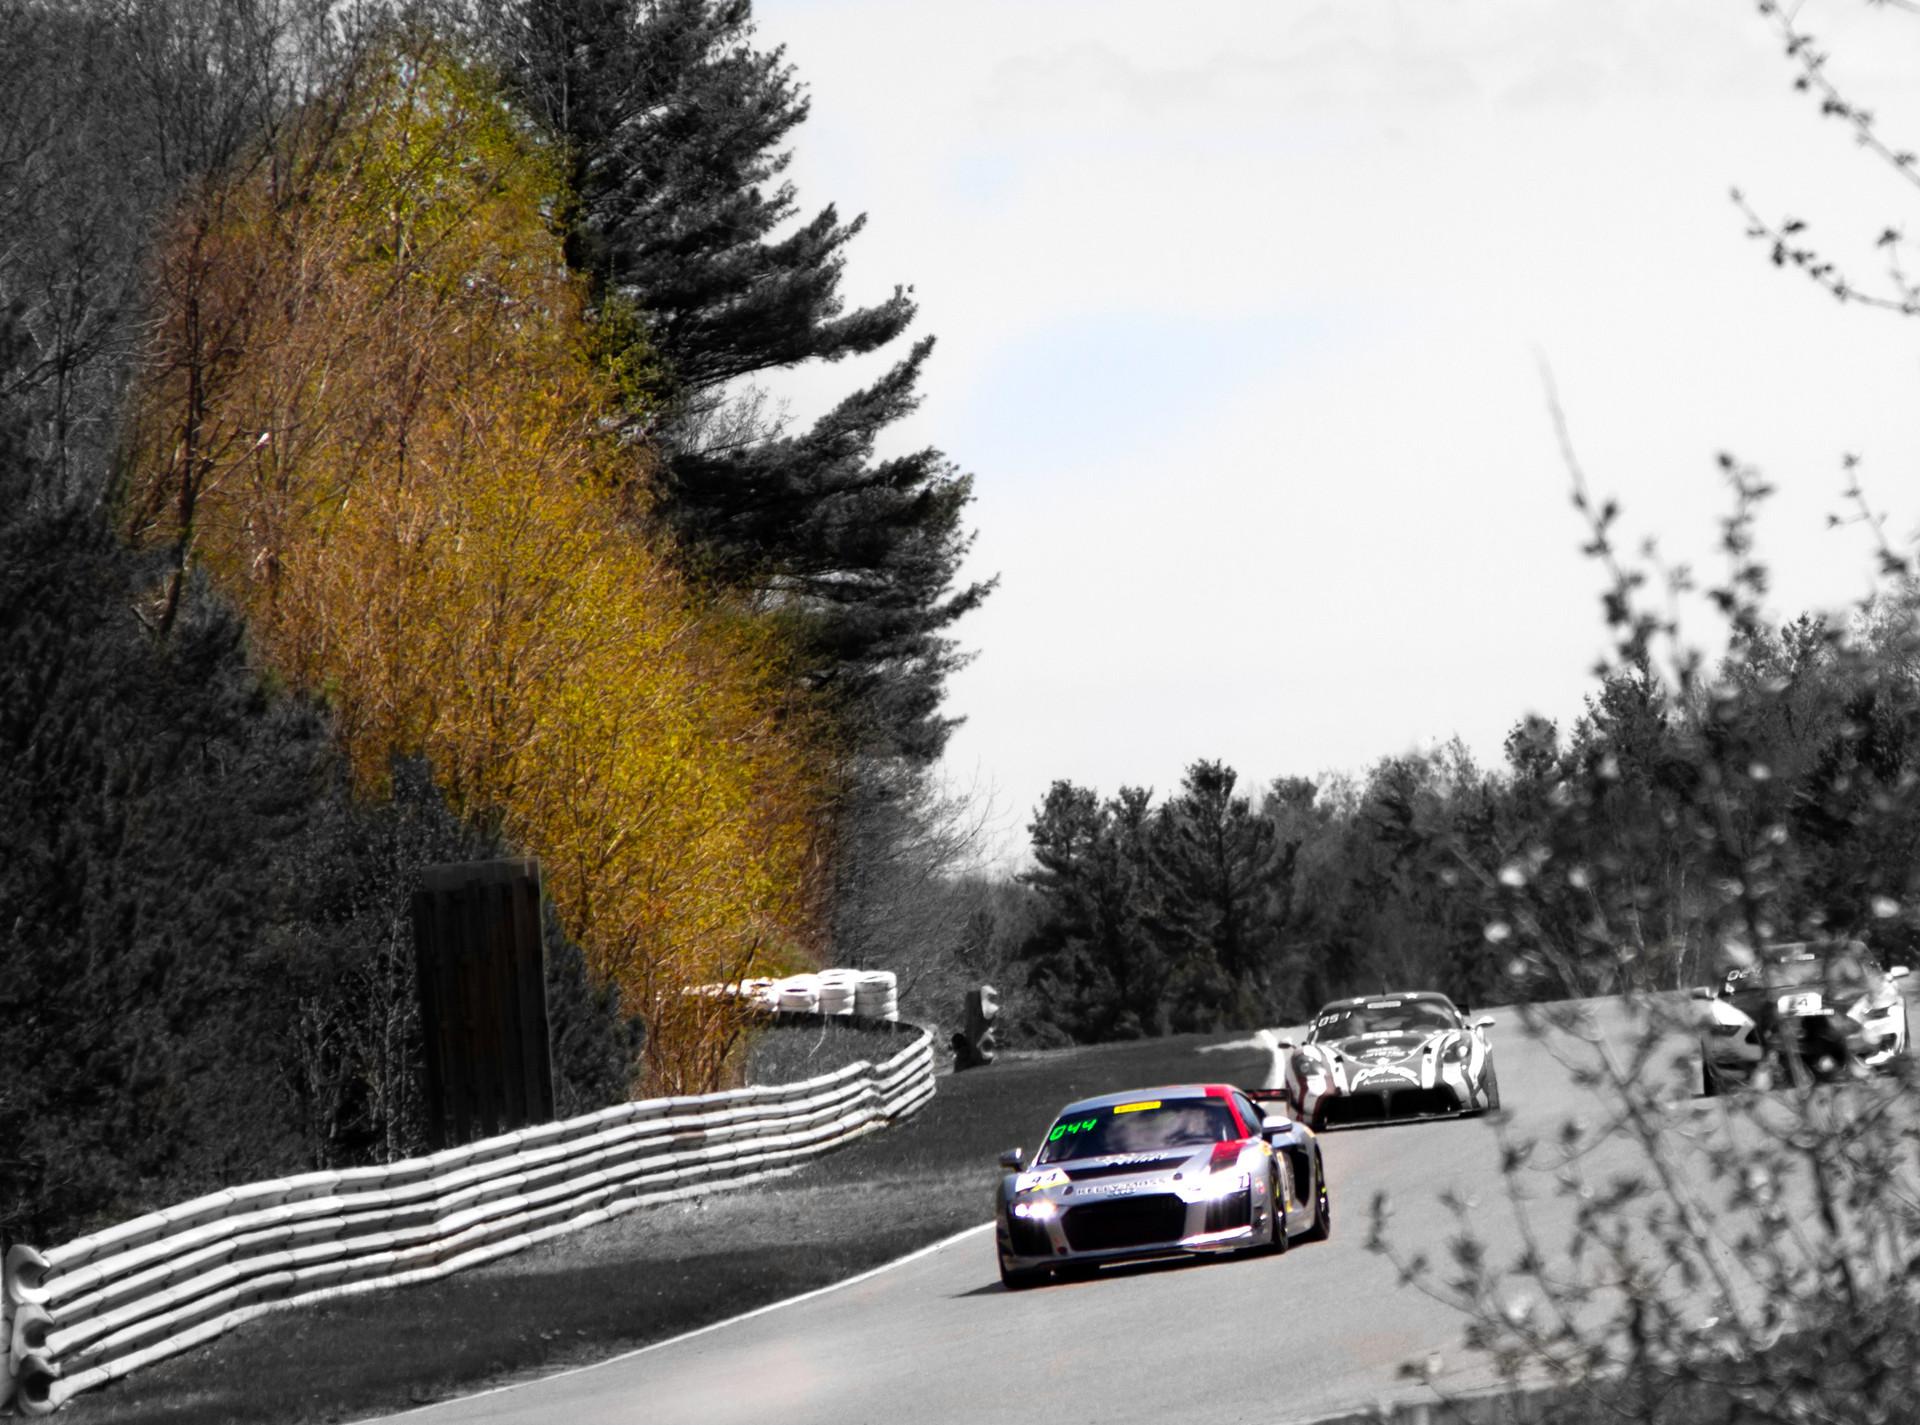 colouredR8&tree.jpg